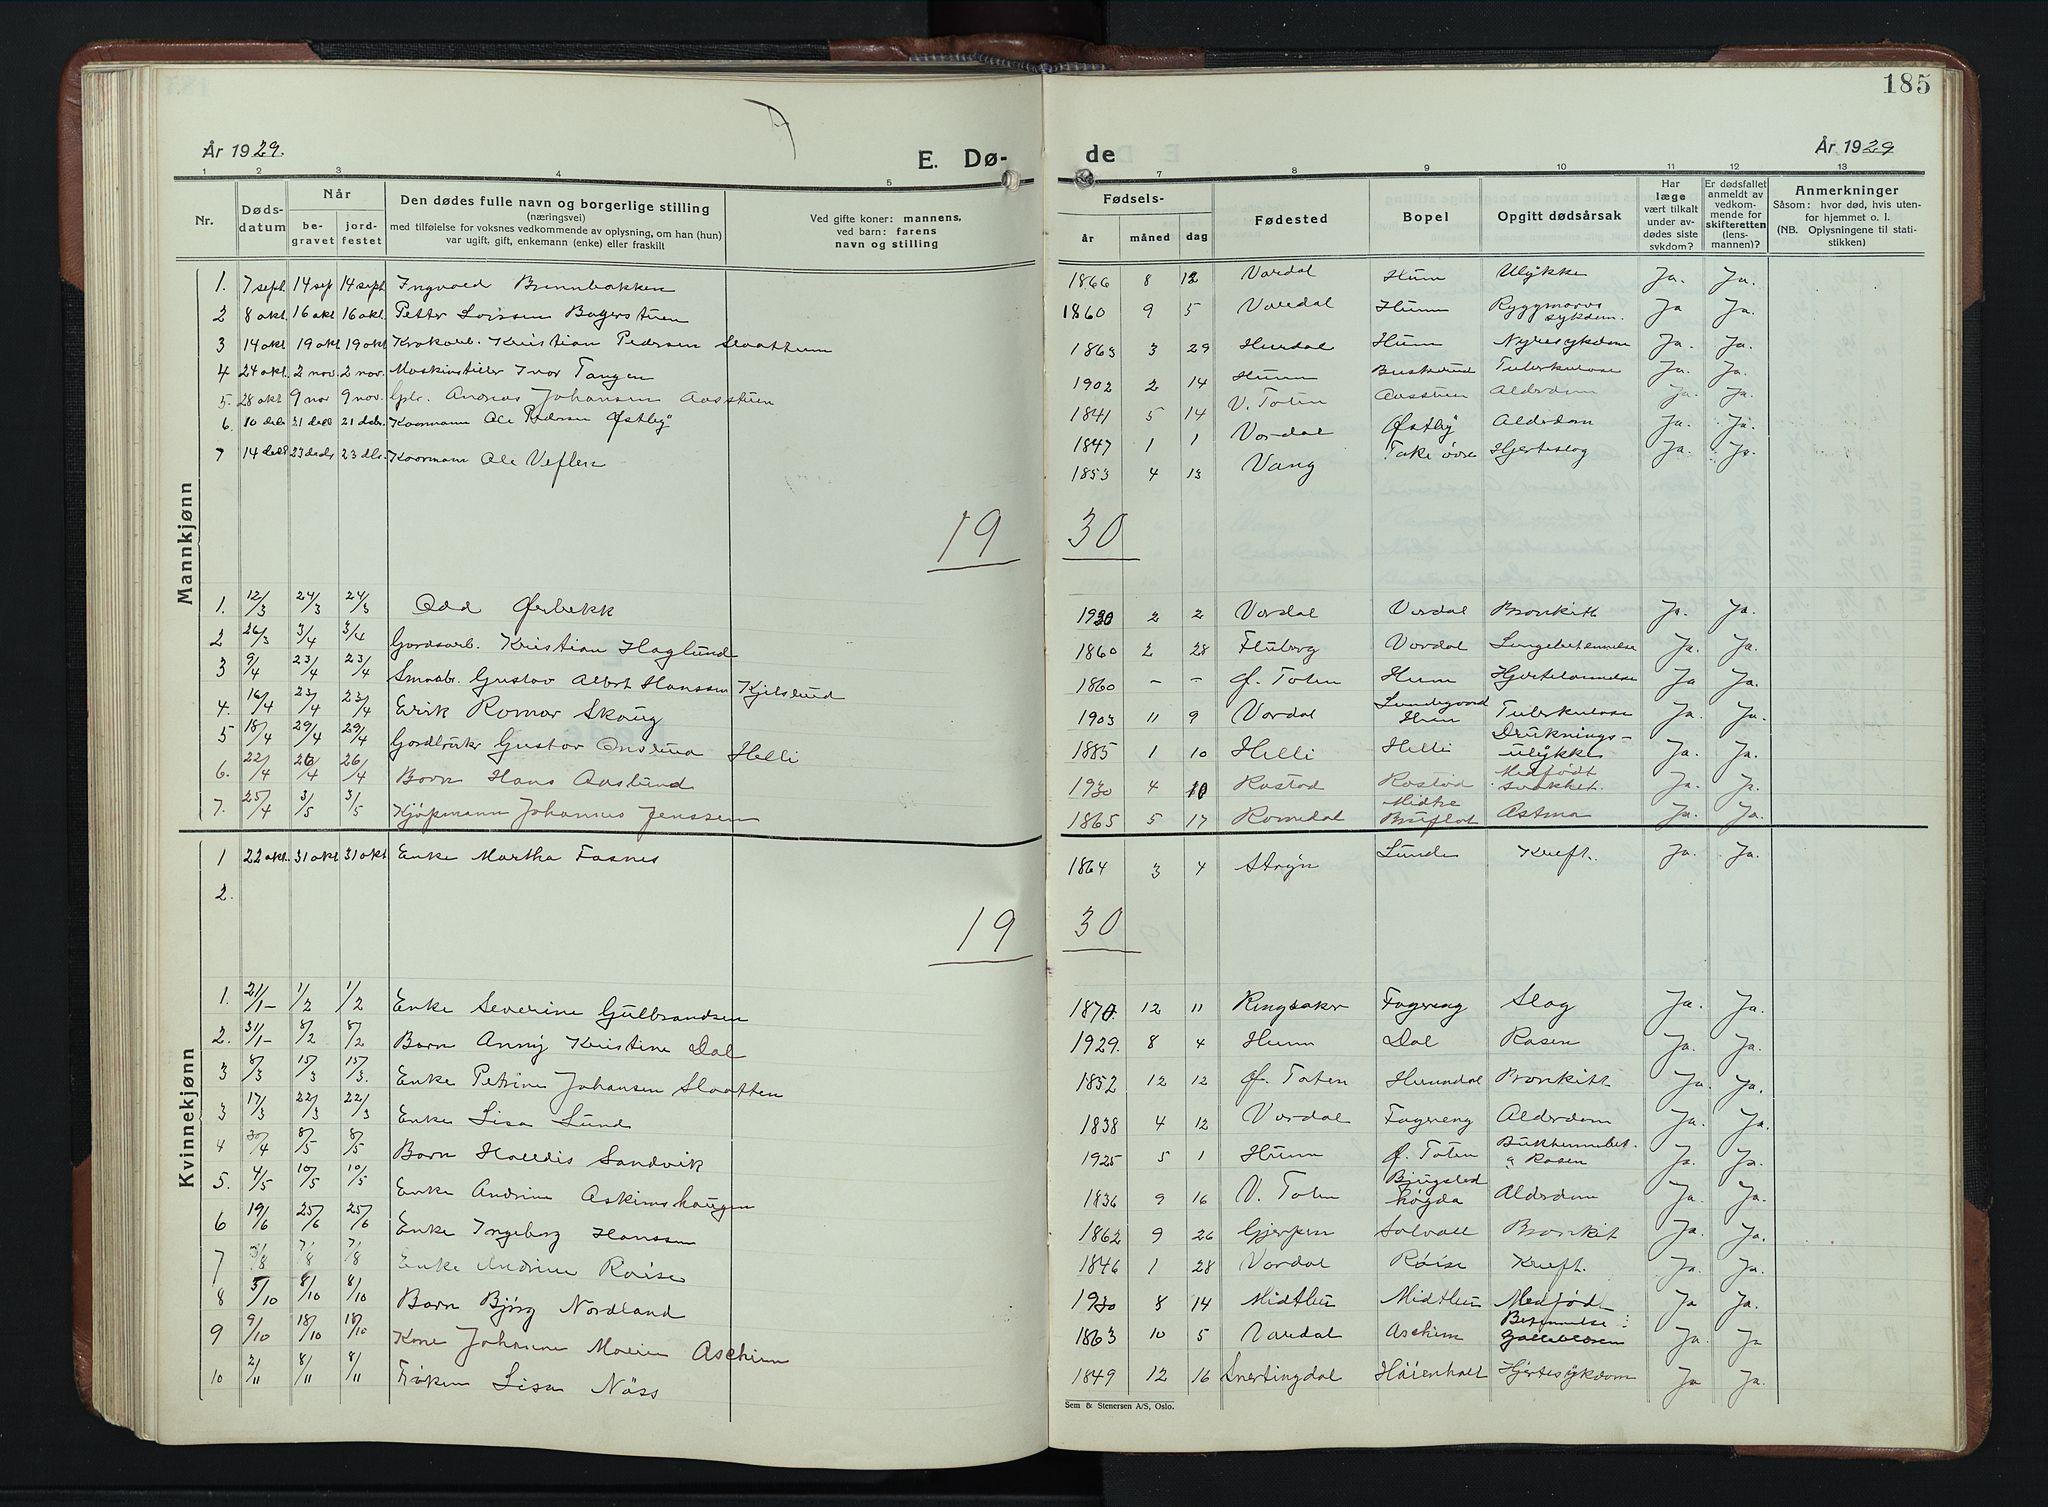 SAH, Vardal prestekontor, H/Ha/Hab/L0023: Klokkerbok nr. 23, 1929-1941, s. 185